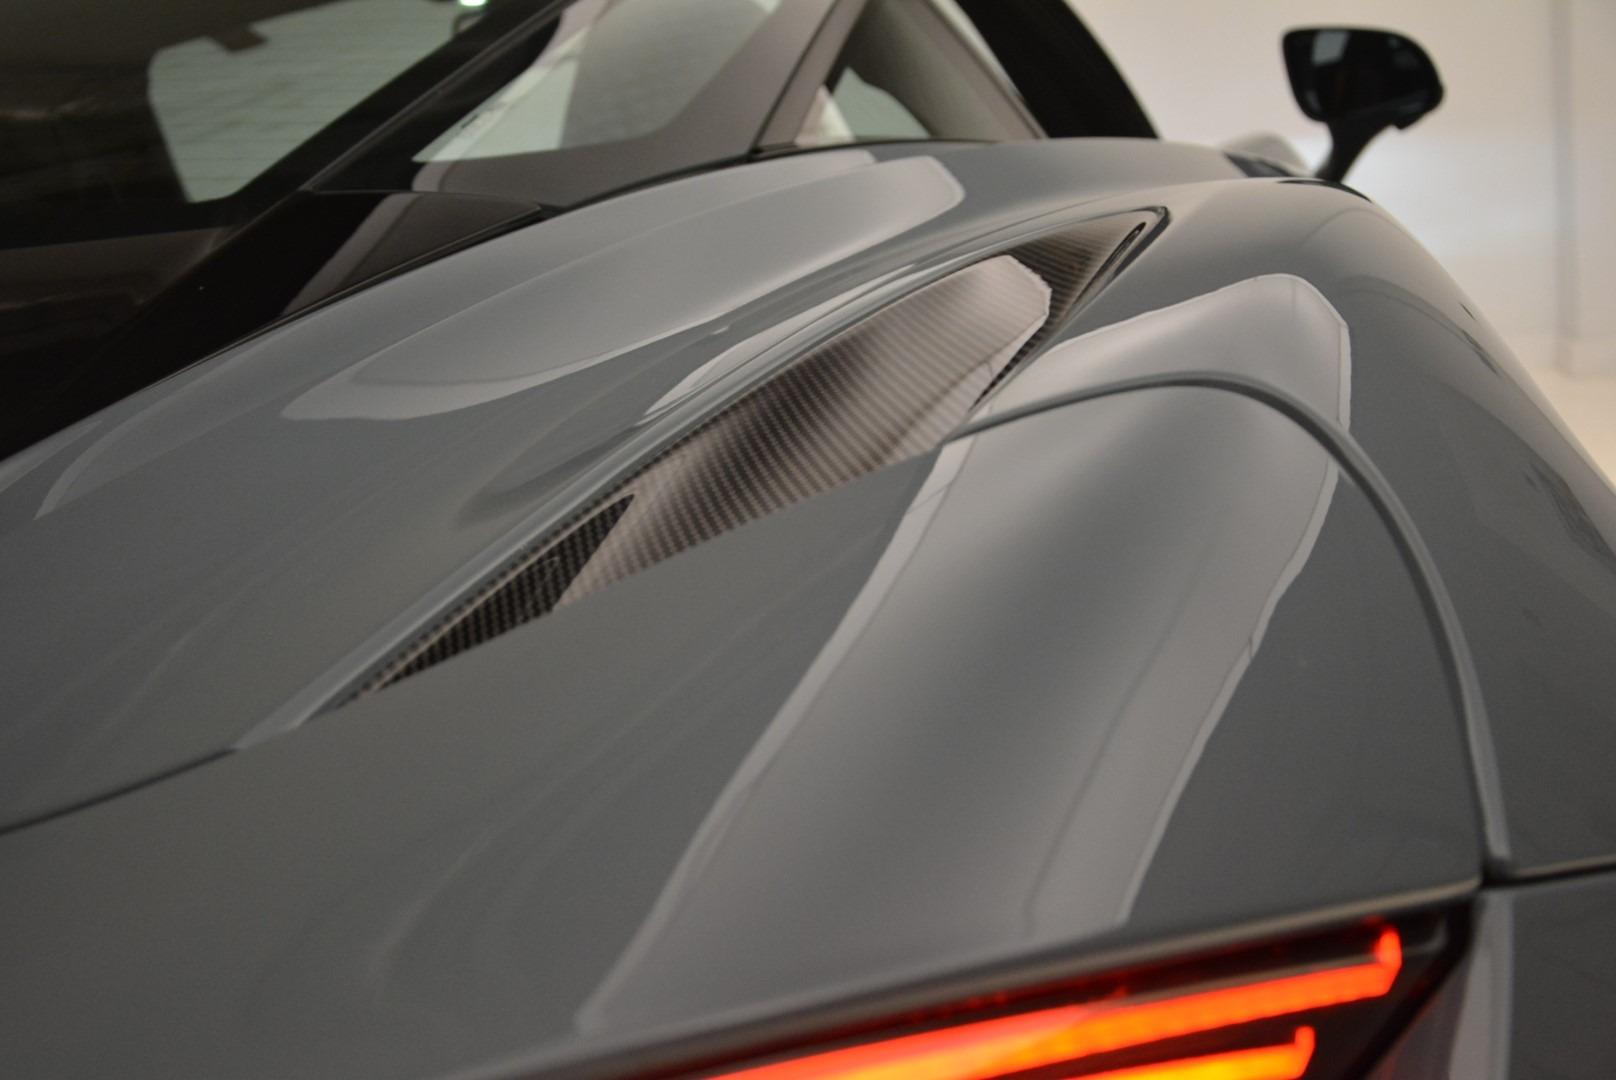 Used 2018 McLaren 720S Coupe For Sale In Westport, CT 3205_p24